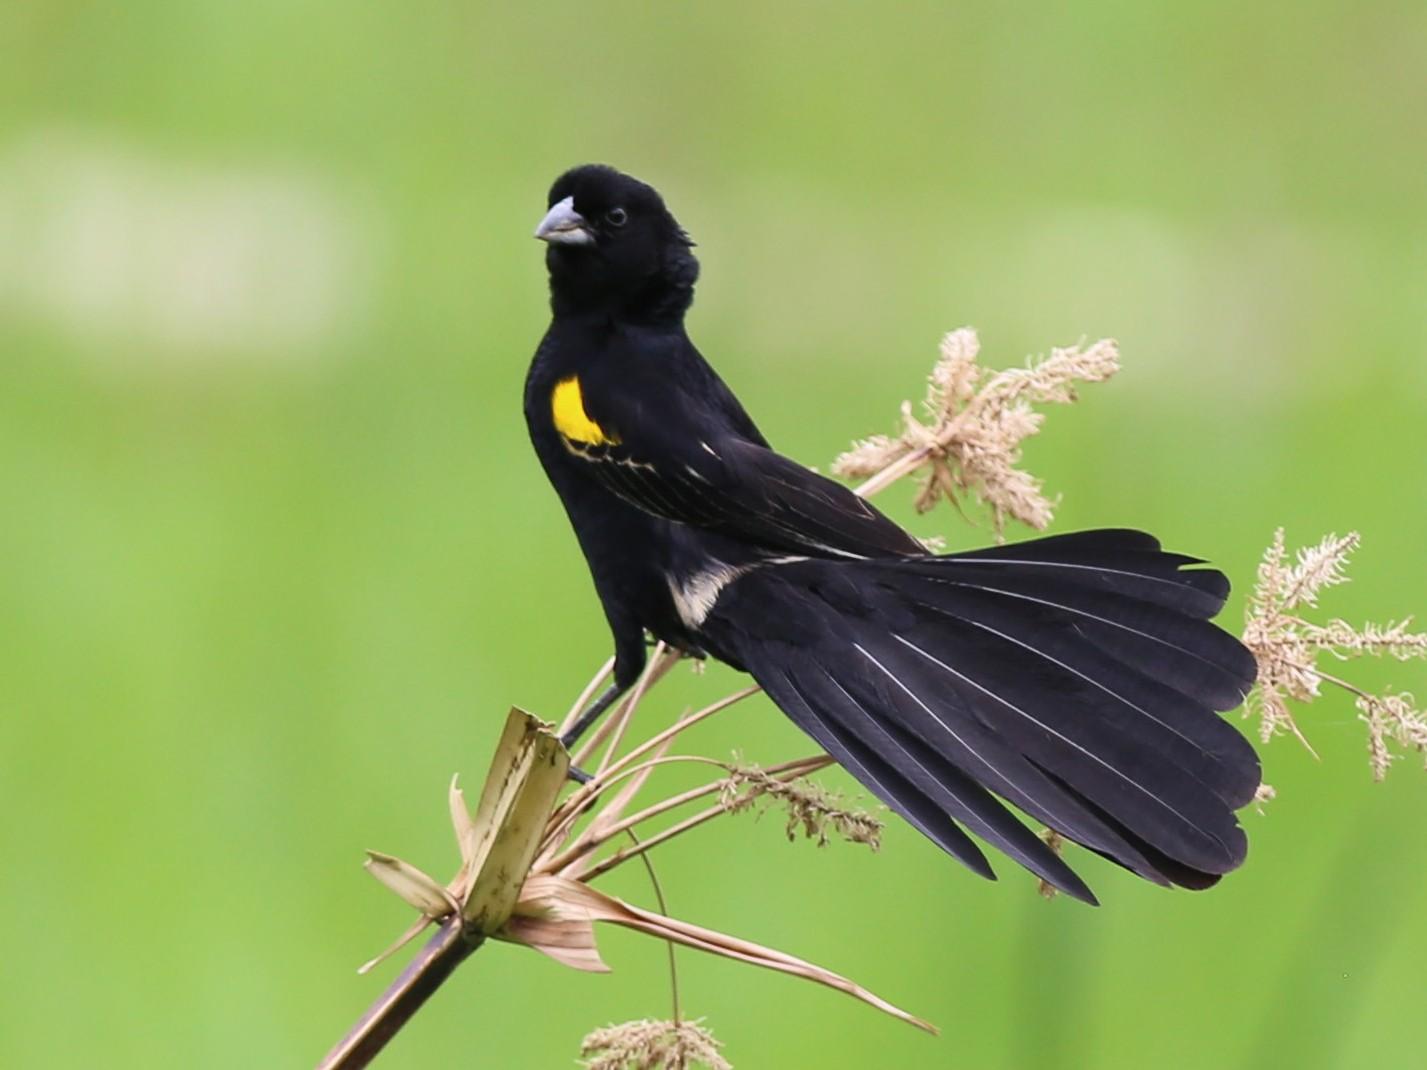 Yellow-mantled Widowbird - Fikret Ataşalan